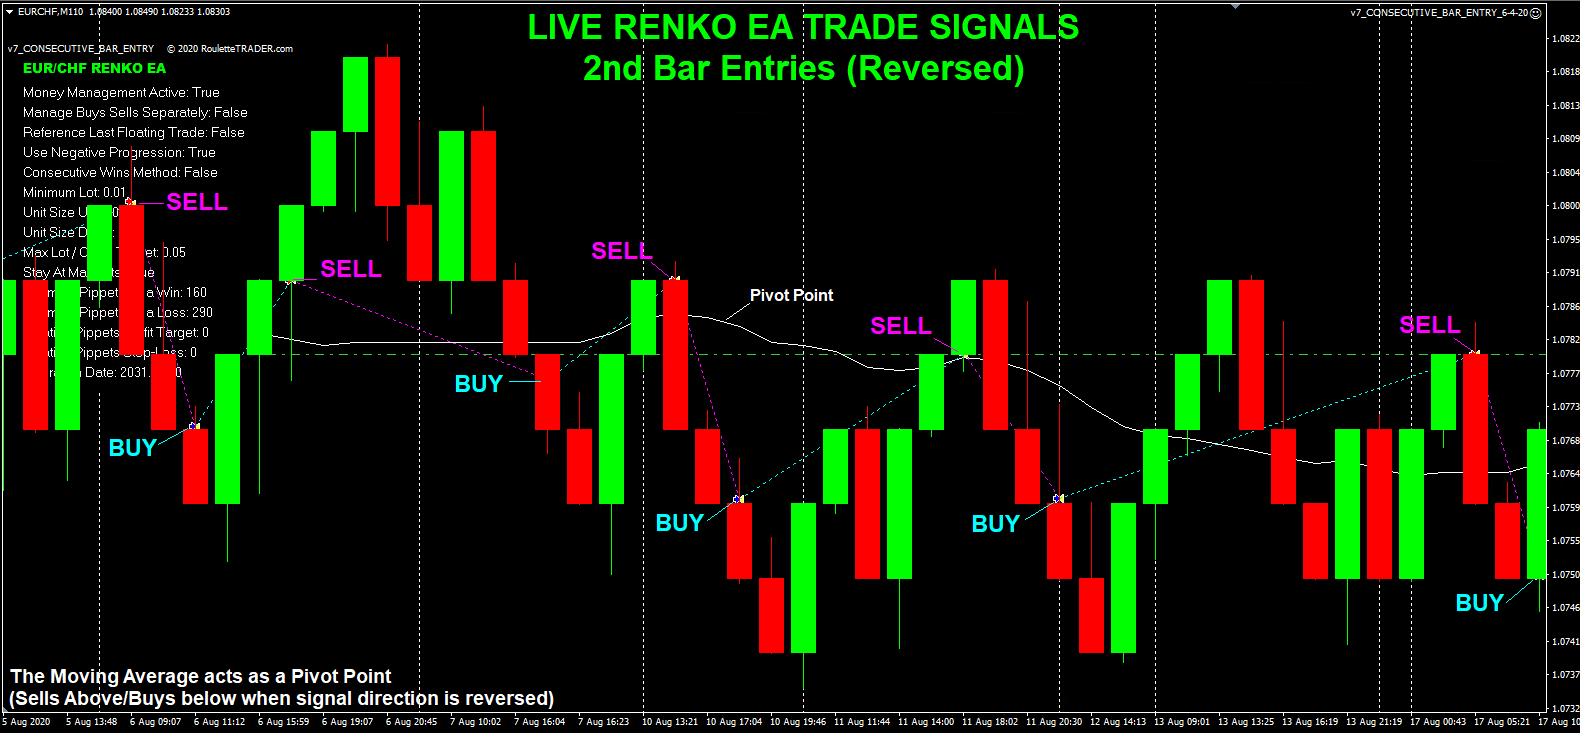 RENKO Trade Signals